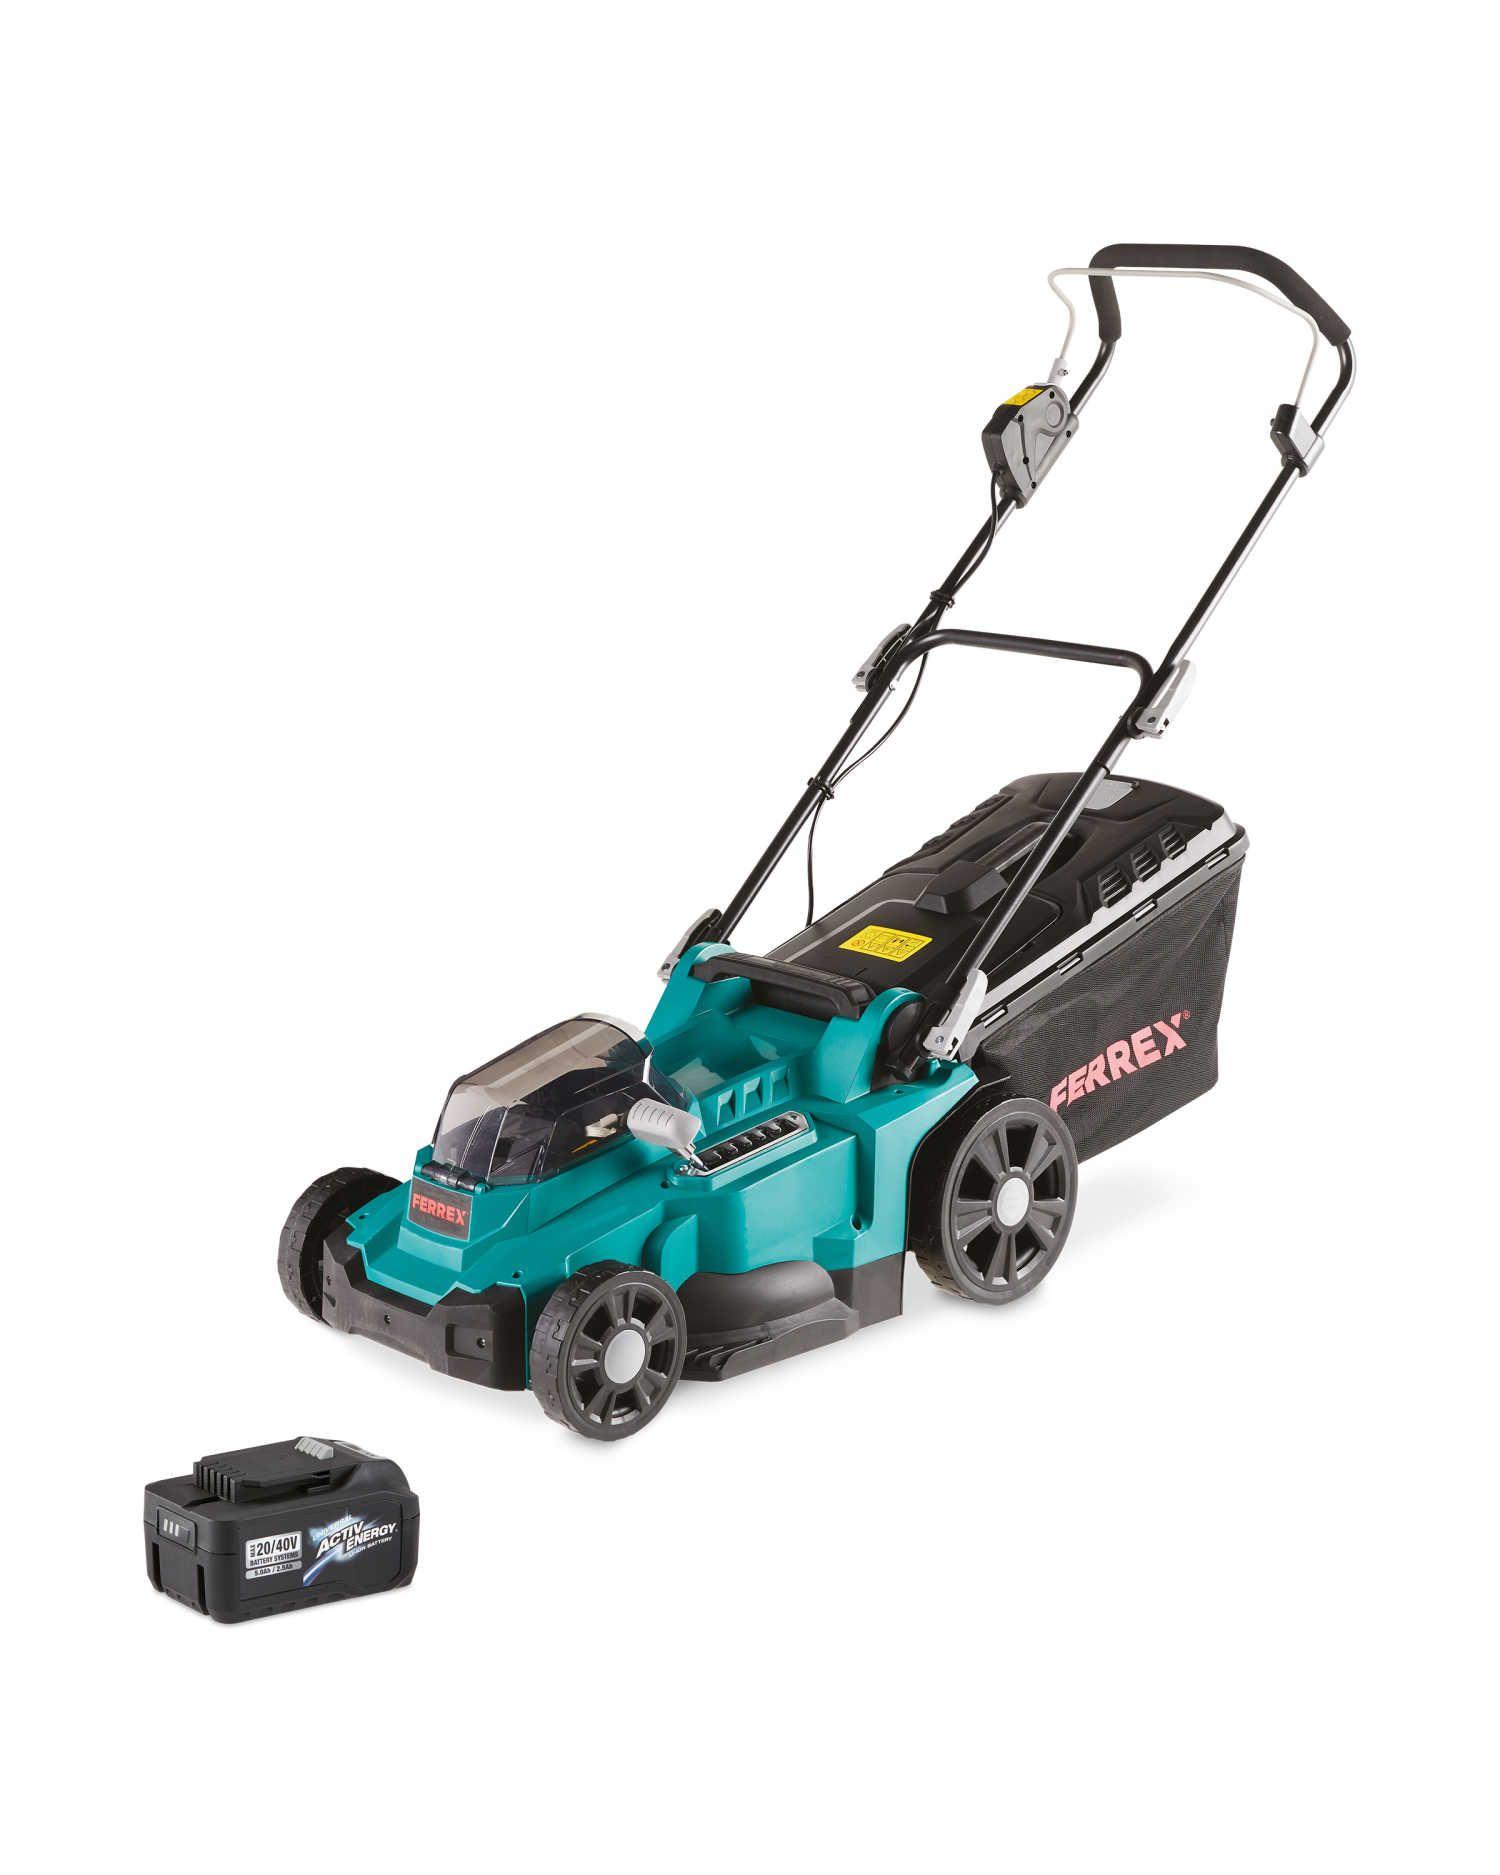 Ferrex Cordless Lawn Mower & 20/40V Battery £115 at Aldi